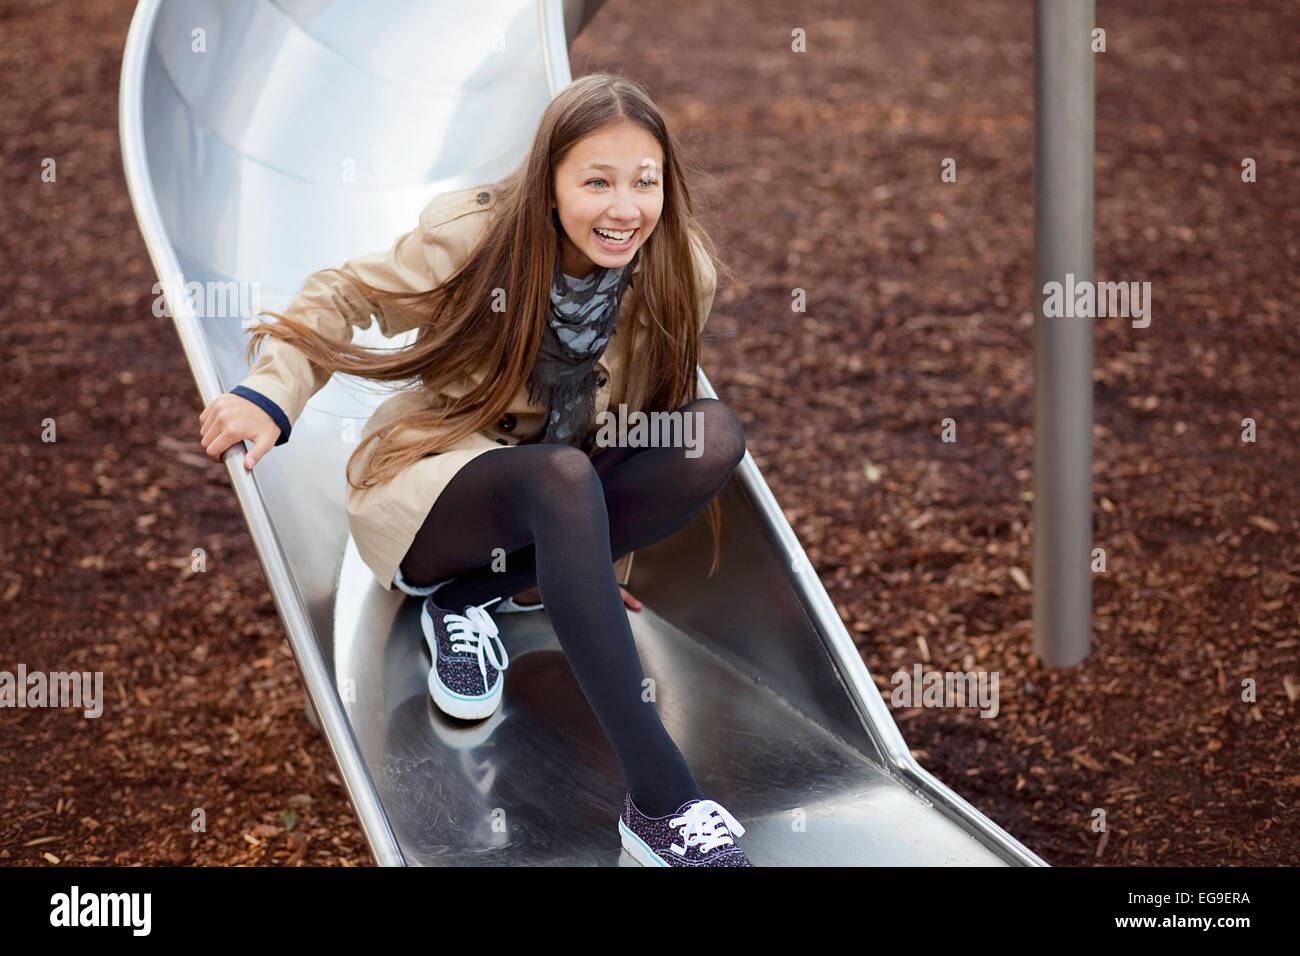 Young girl (12-13) having fun on slide - Stock Image